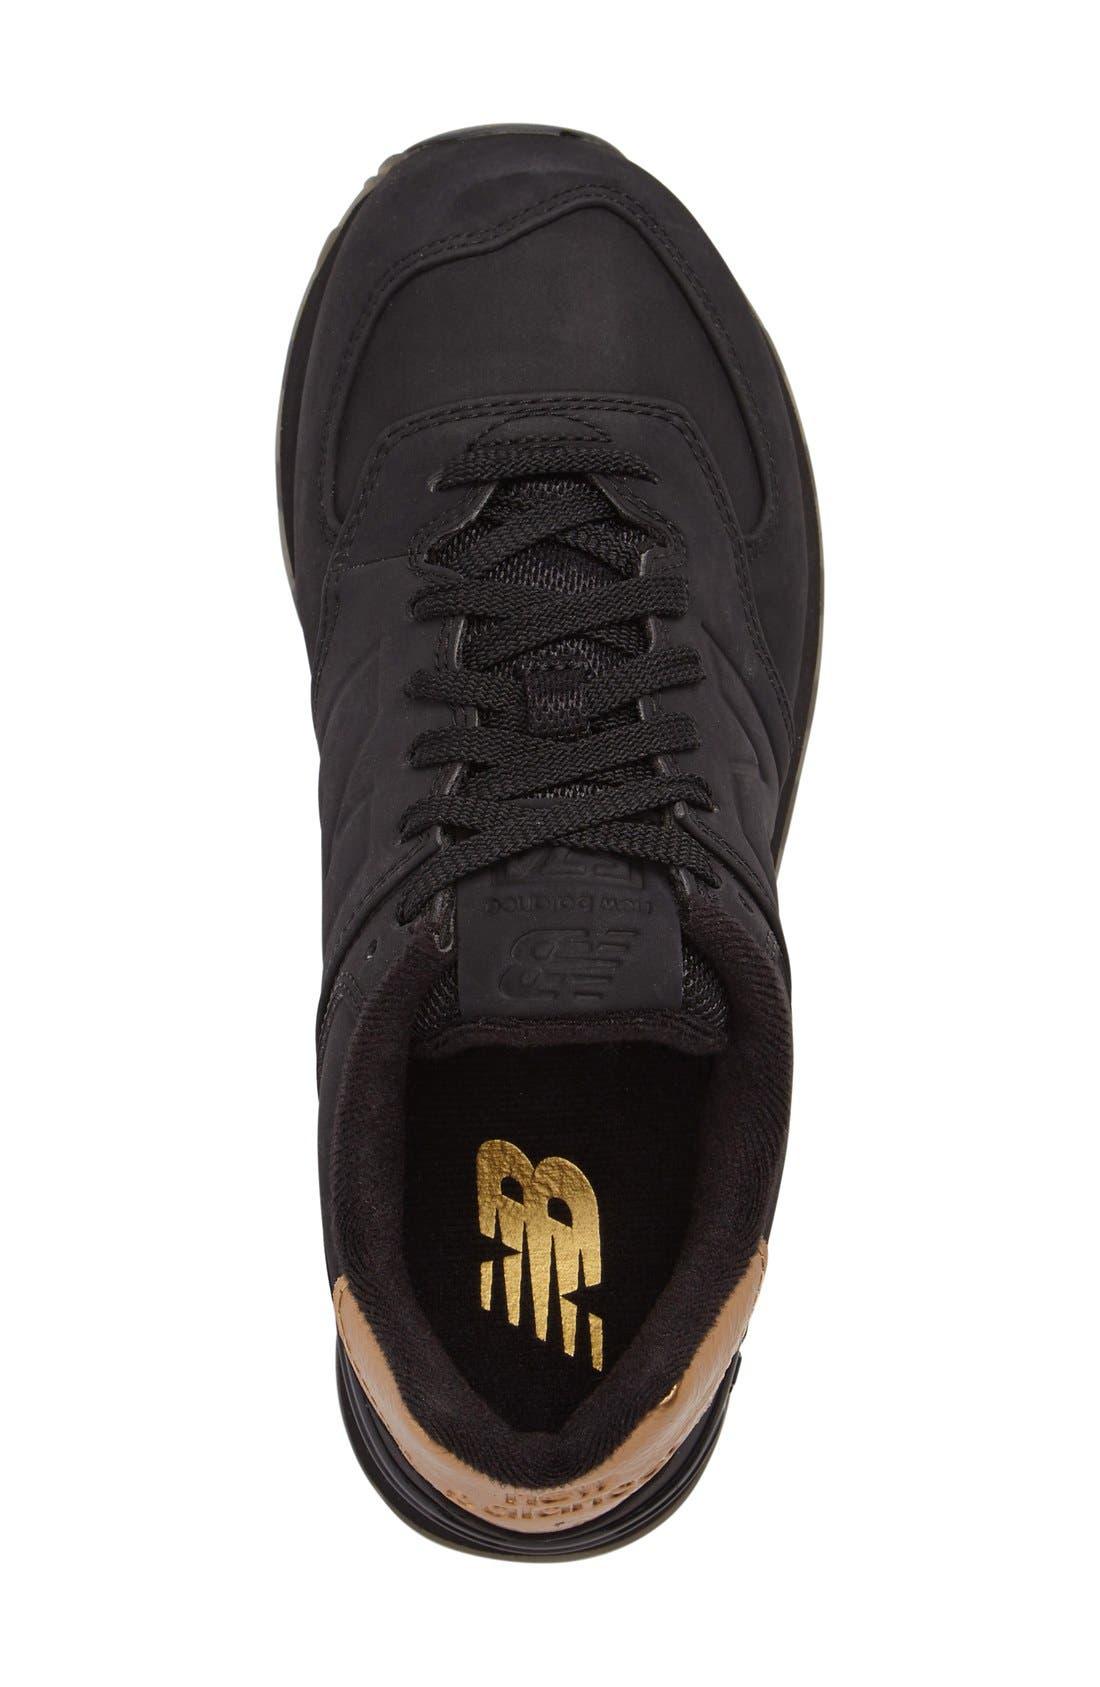 Q416 Retro 574 Sneaker,                             Alternate thumbnail 2, color,                             009